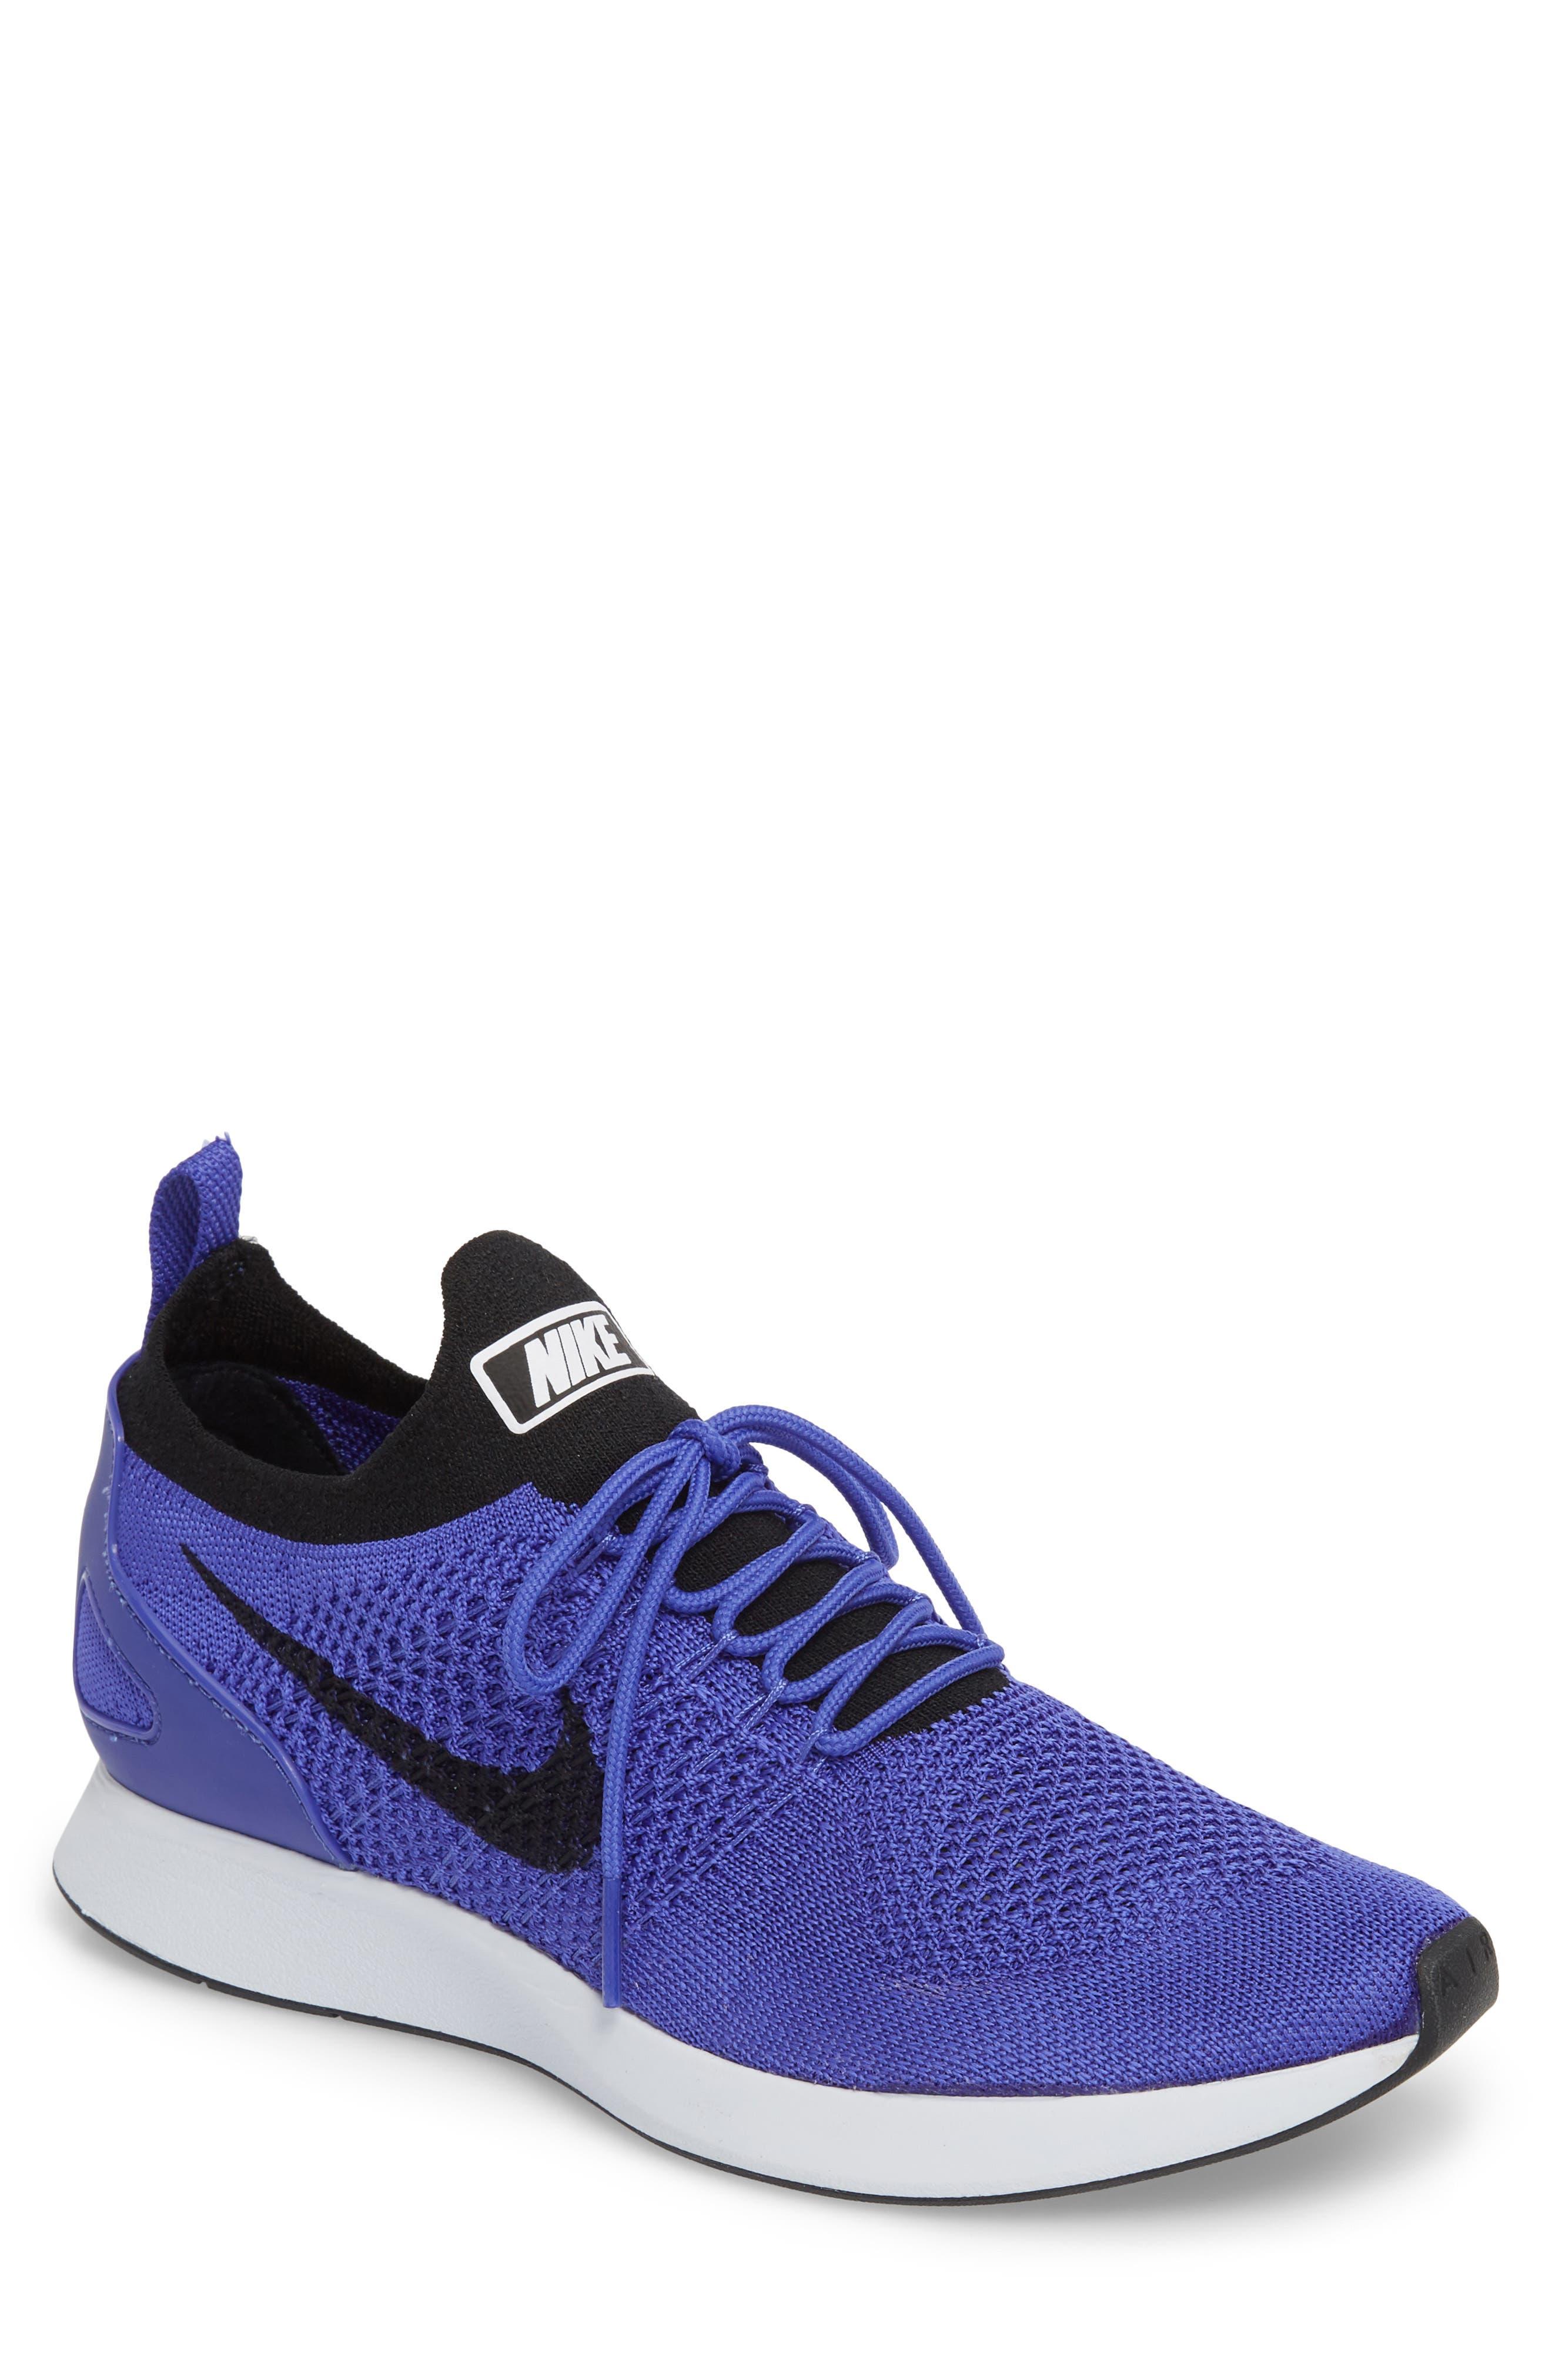 Air Zoom Mariah Flyknit Racer Sneaker,                         Main,                         color, VIOLET/ BLACK/ WHITE